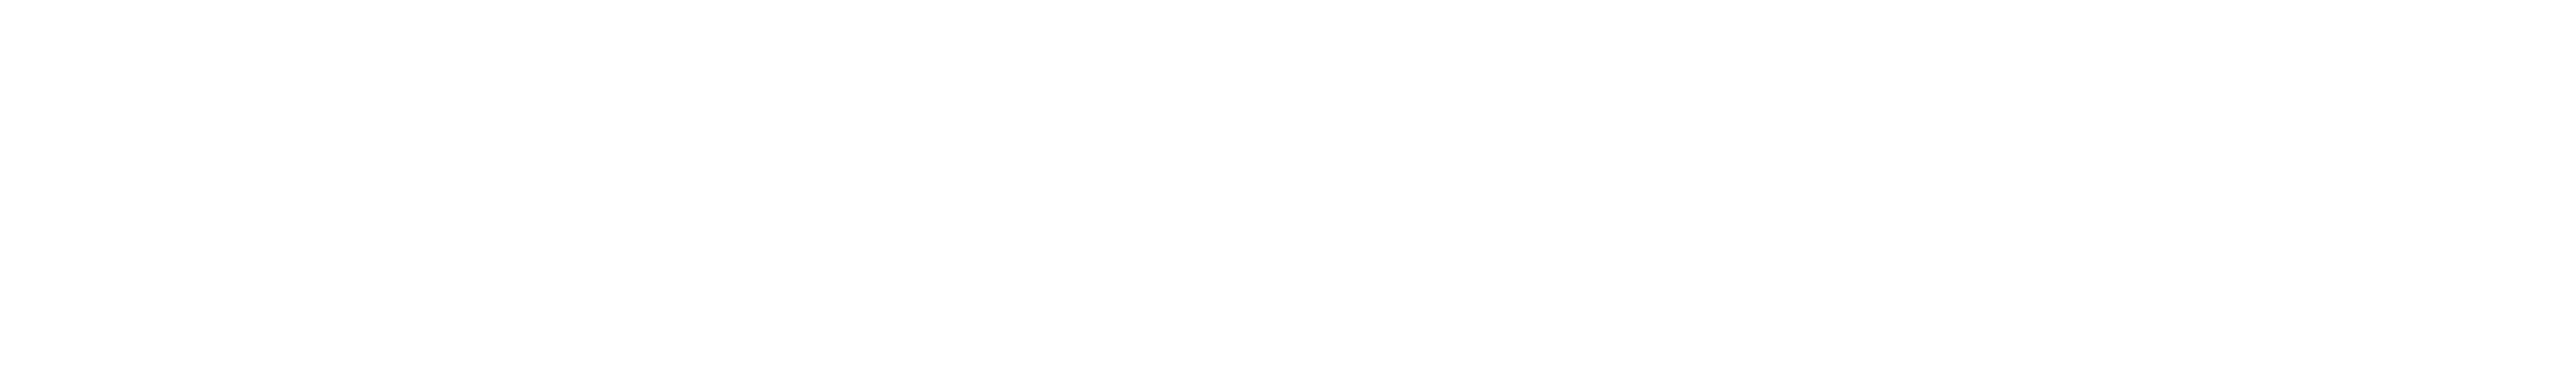 Calle Hammer